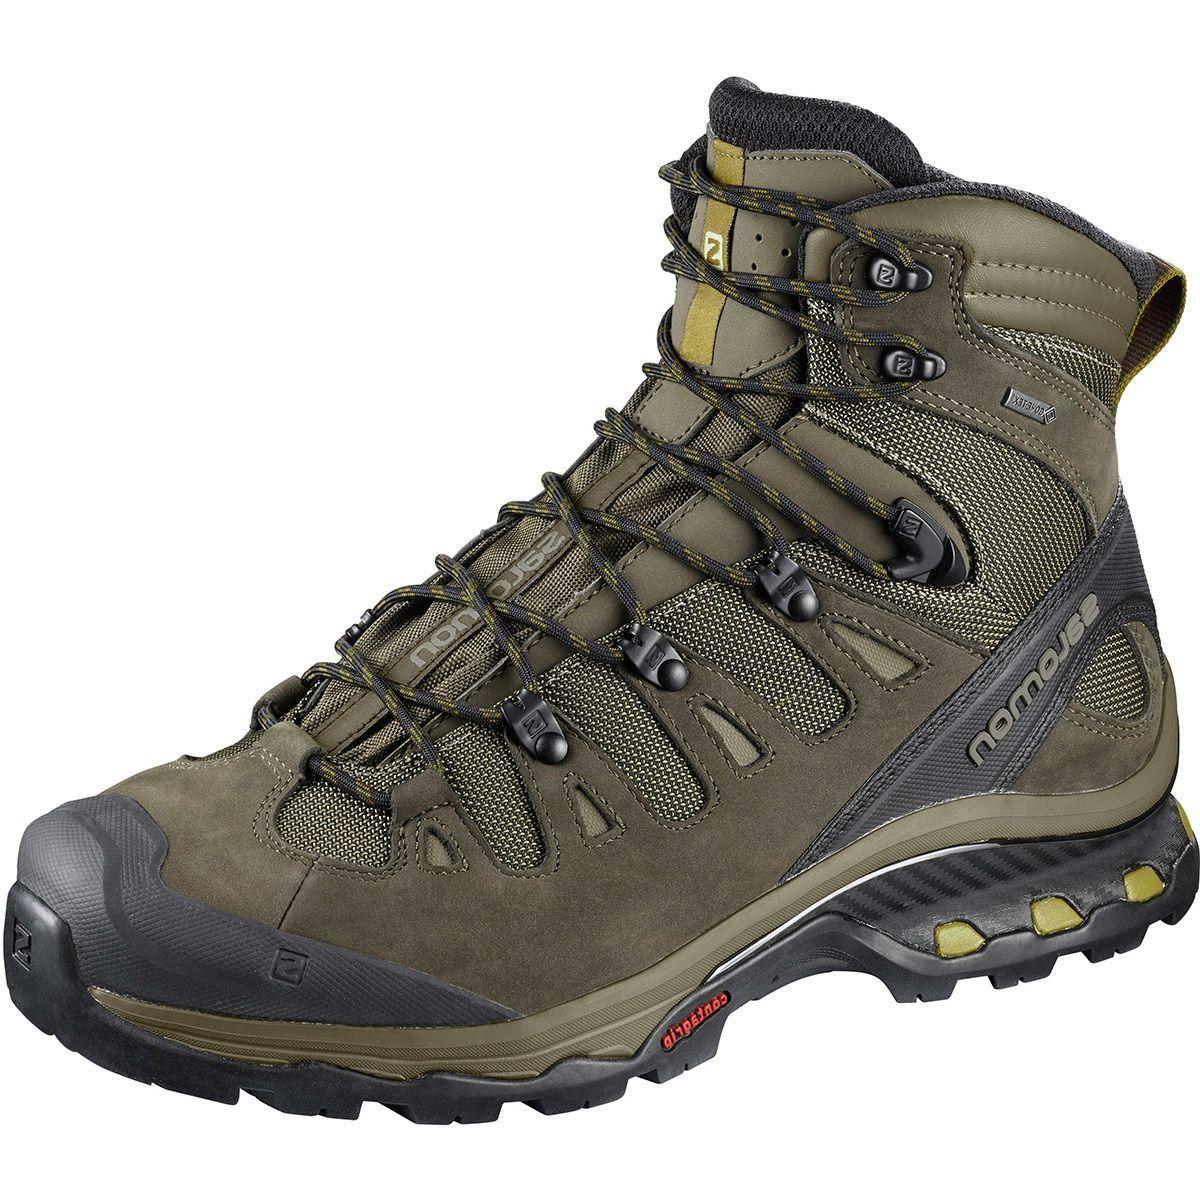 Salomon Quest 4D 3 GTX Backpacking Boot - Men's